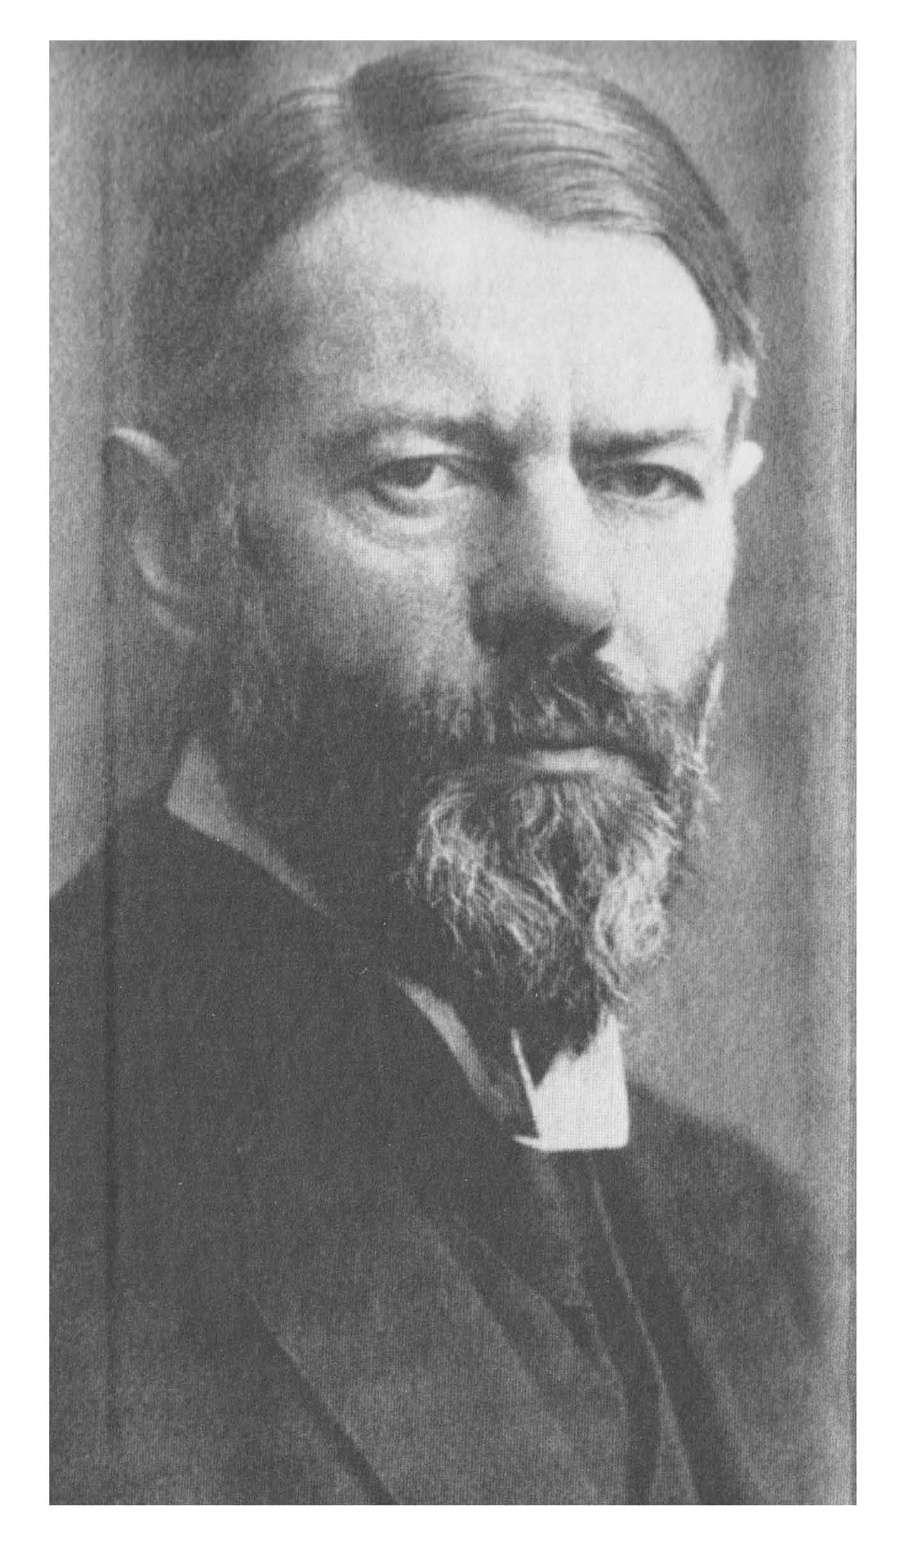 O Μαξιμίλιαν Καρλ Έμιλ Βέμπερ (Maximilian Karl Emil Max Weber, 21 Απριλίου 1864 – 14 Ιουνίου 1920) ήταν Γερμανός κοινωνιολόγος και πολιτικός οικονομολόγος, του οποίου οι ιδέες επηρέασαν την κοινωνική θεωρία, την κοινωνική έρευνα και το σύνολο της επιστήμης της κοινωνιολογίας.